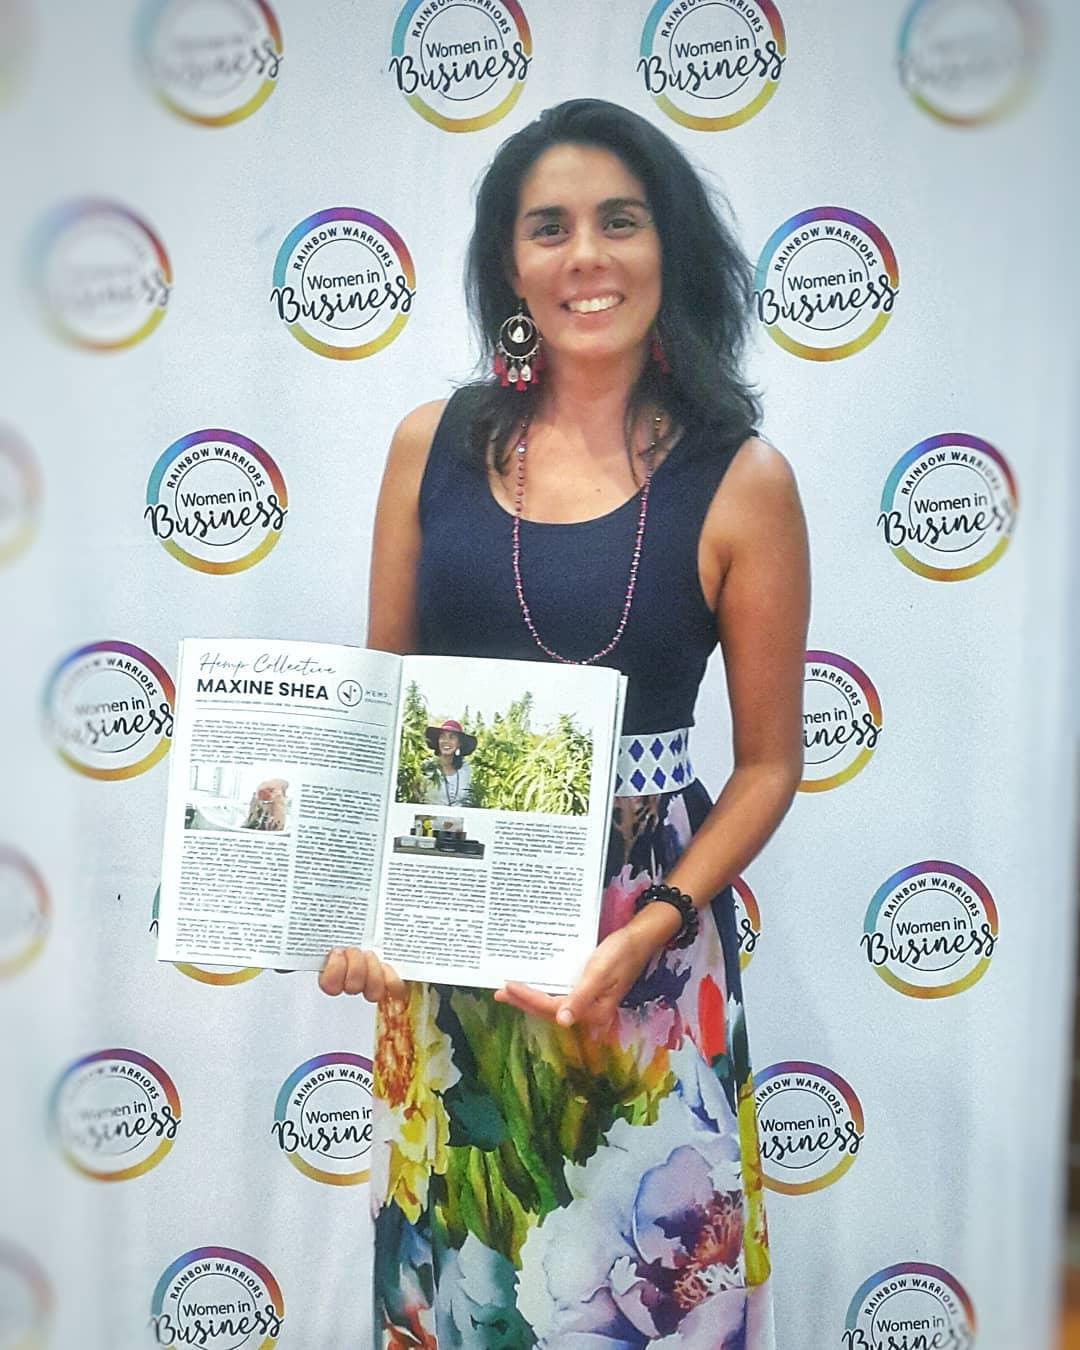 Hemp Collective featured in Rainbow Warriors Women in Business Magazine